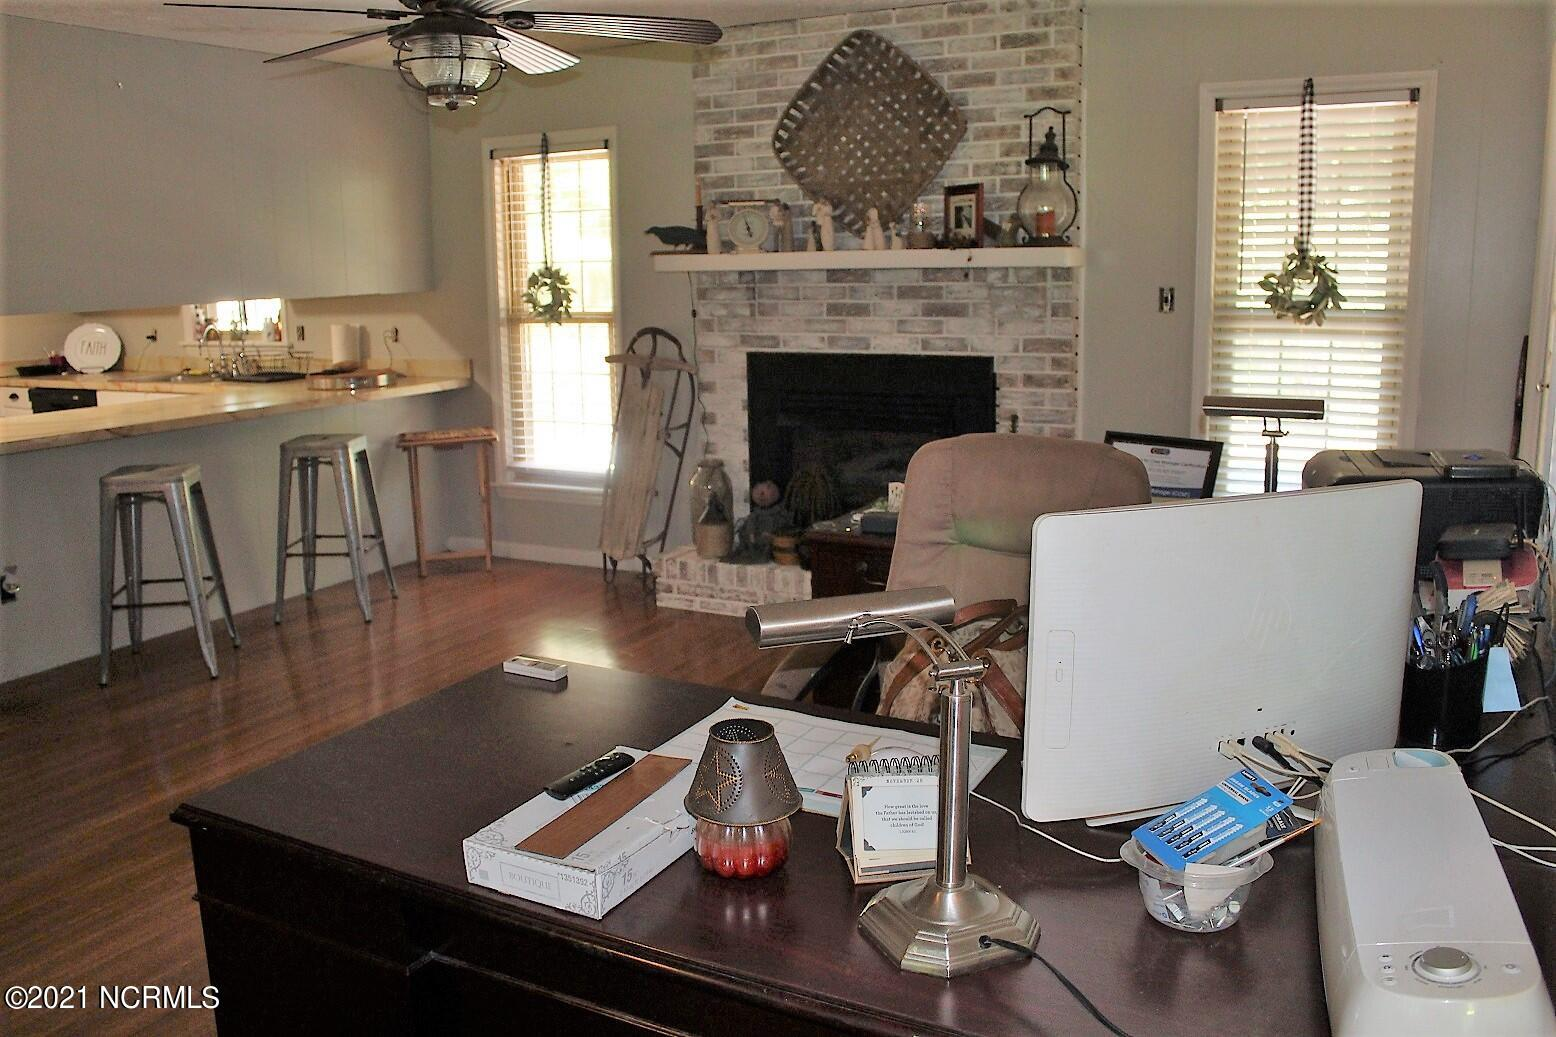 2534 Nc 211 Hwy, Clarkton, North Carolina 28433, 4 Bedrooms Bedrooms, 7 Rooms Rooms,3 BathroomsBathrooms,Single family residence,For sale,Nc 211 Hwy,100278483